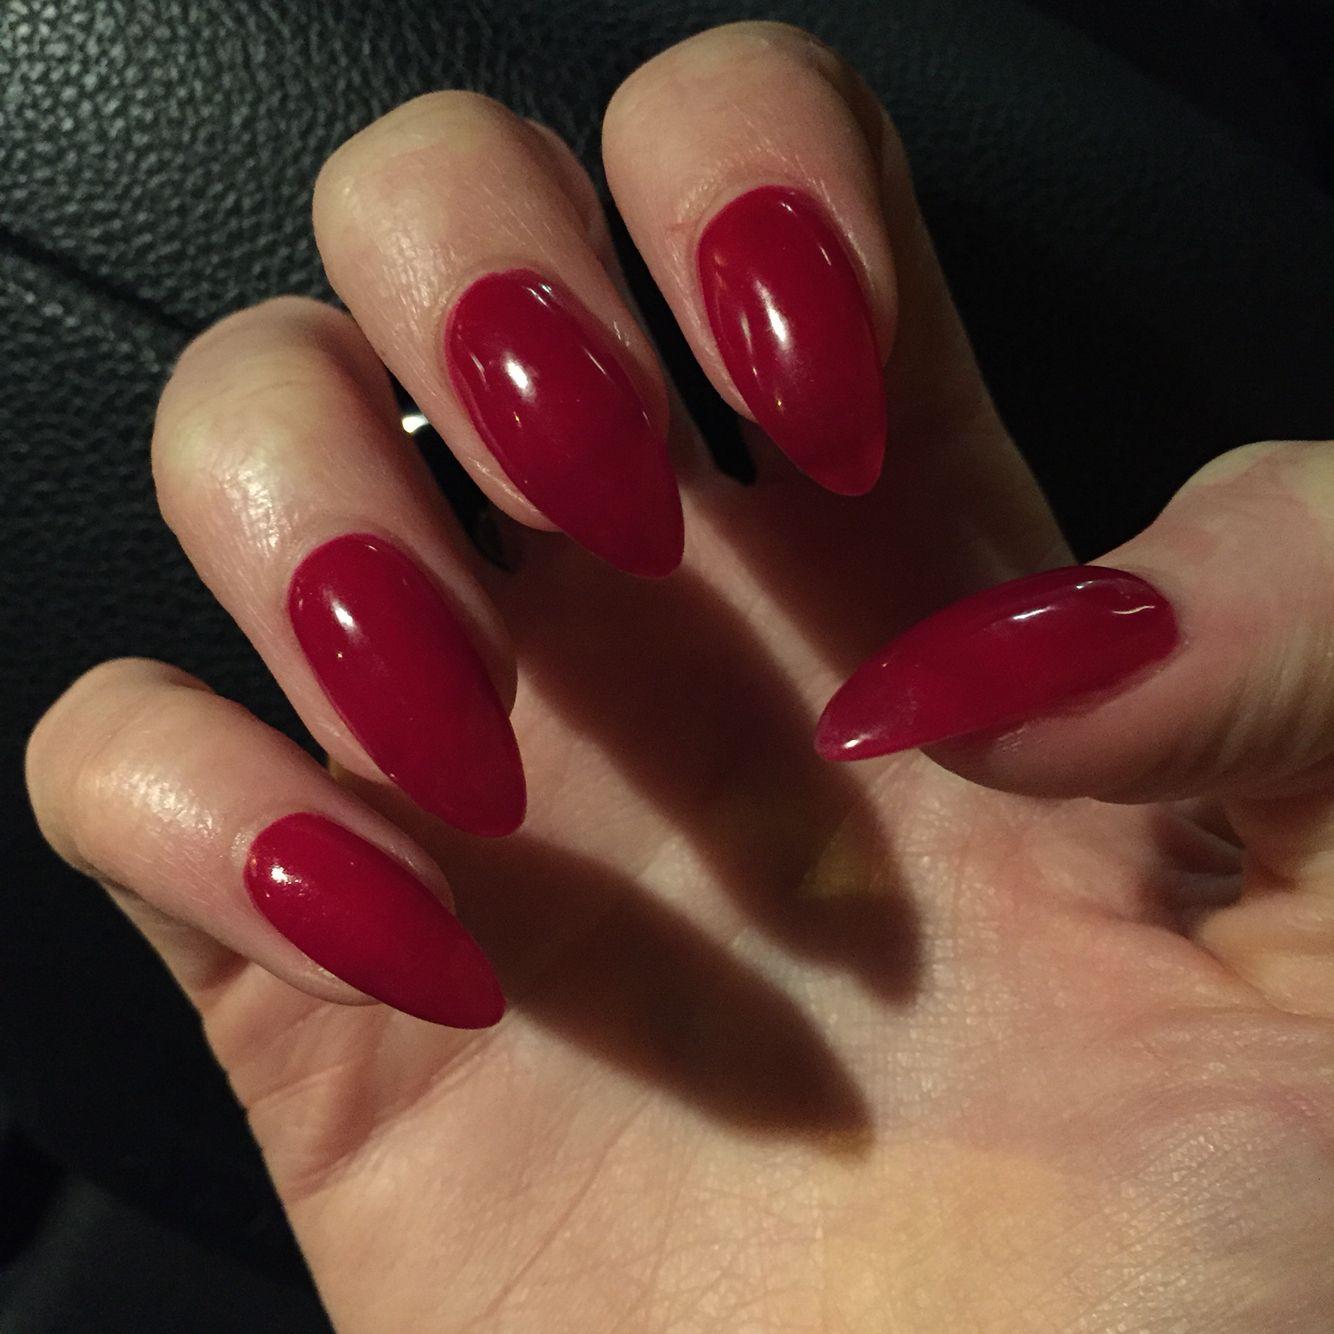 CND Shellac Decadence Stiletto Nails Vamp